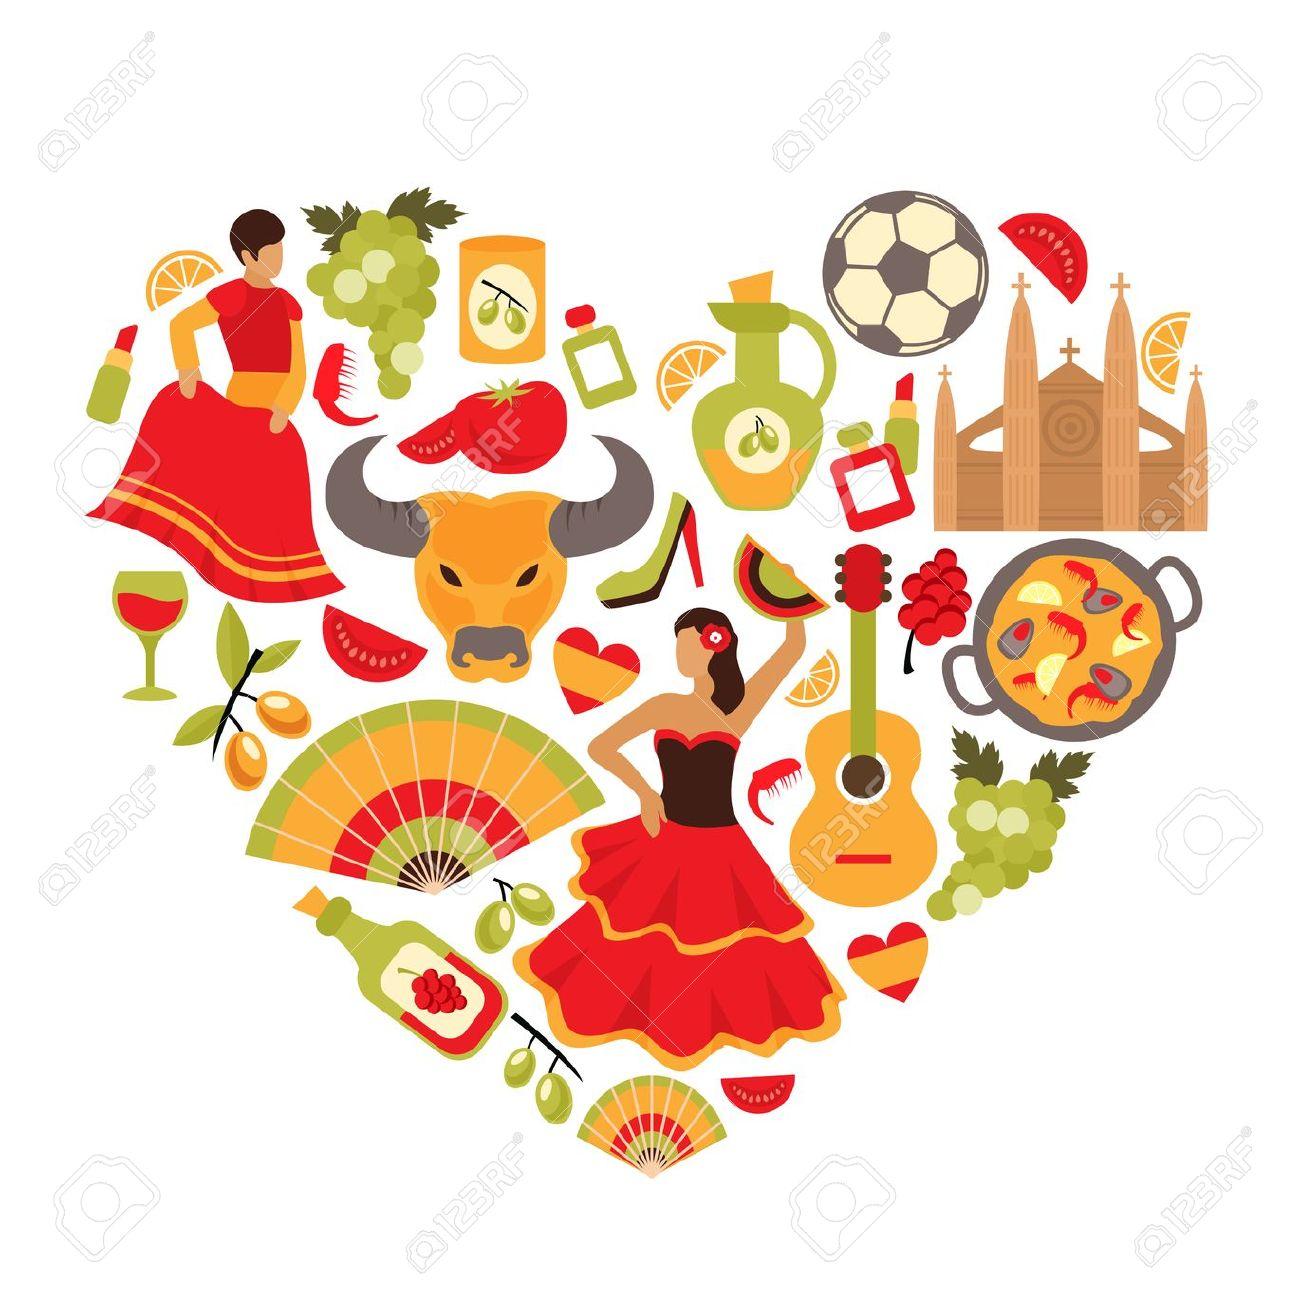 Decorative Spain Cultural Traditions Flamenco Dance Food Grape.